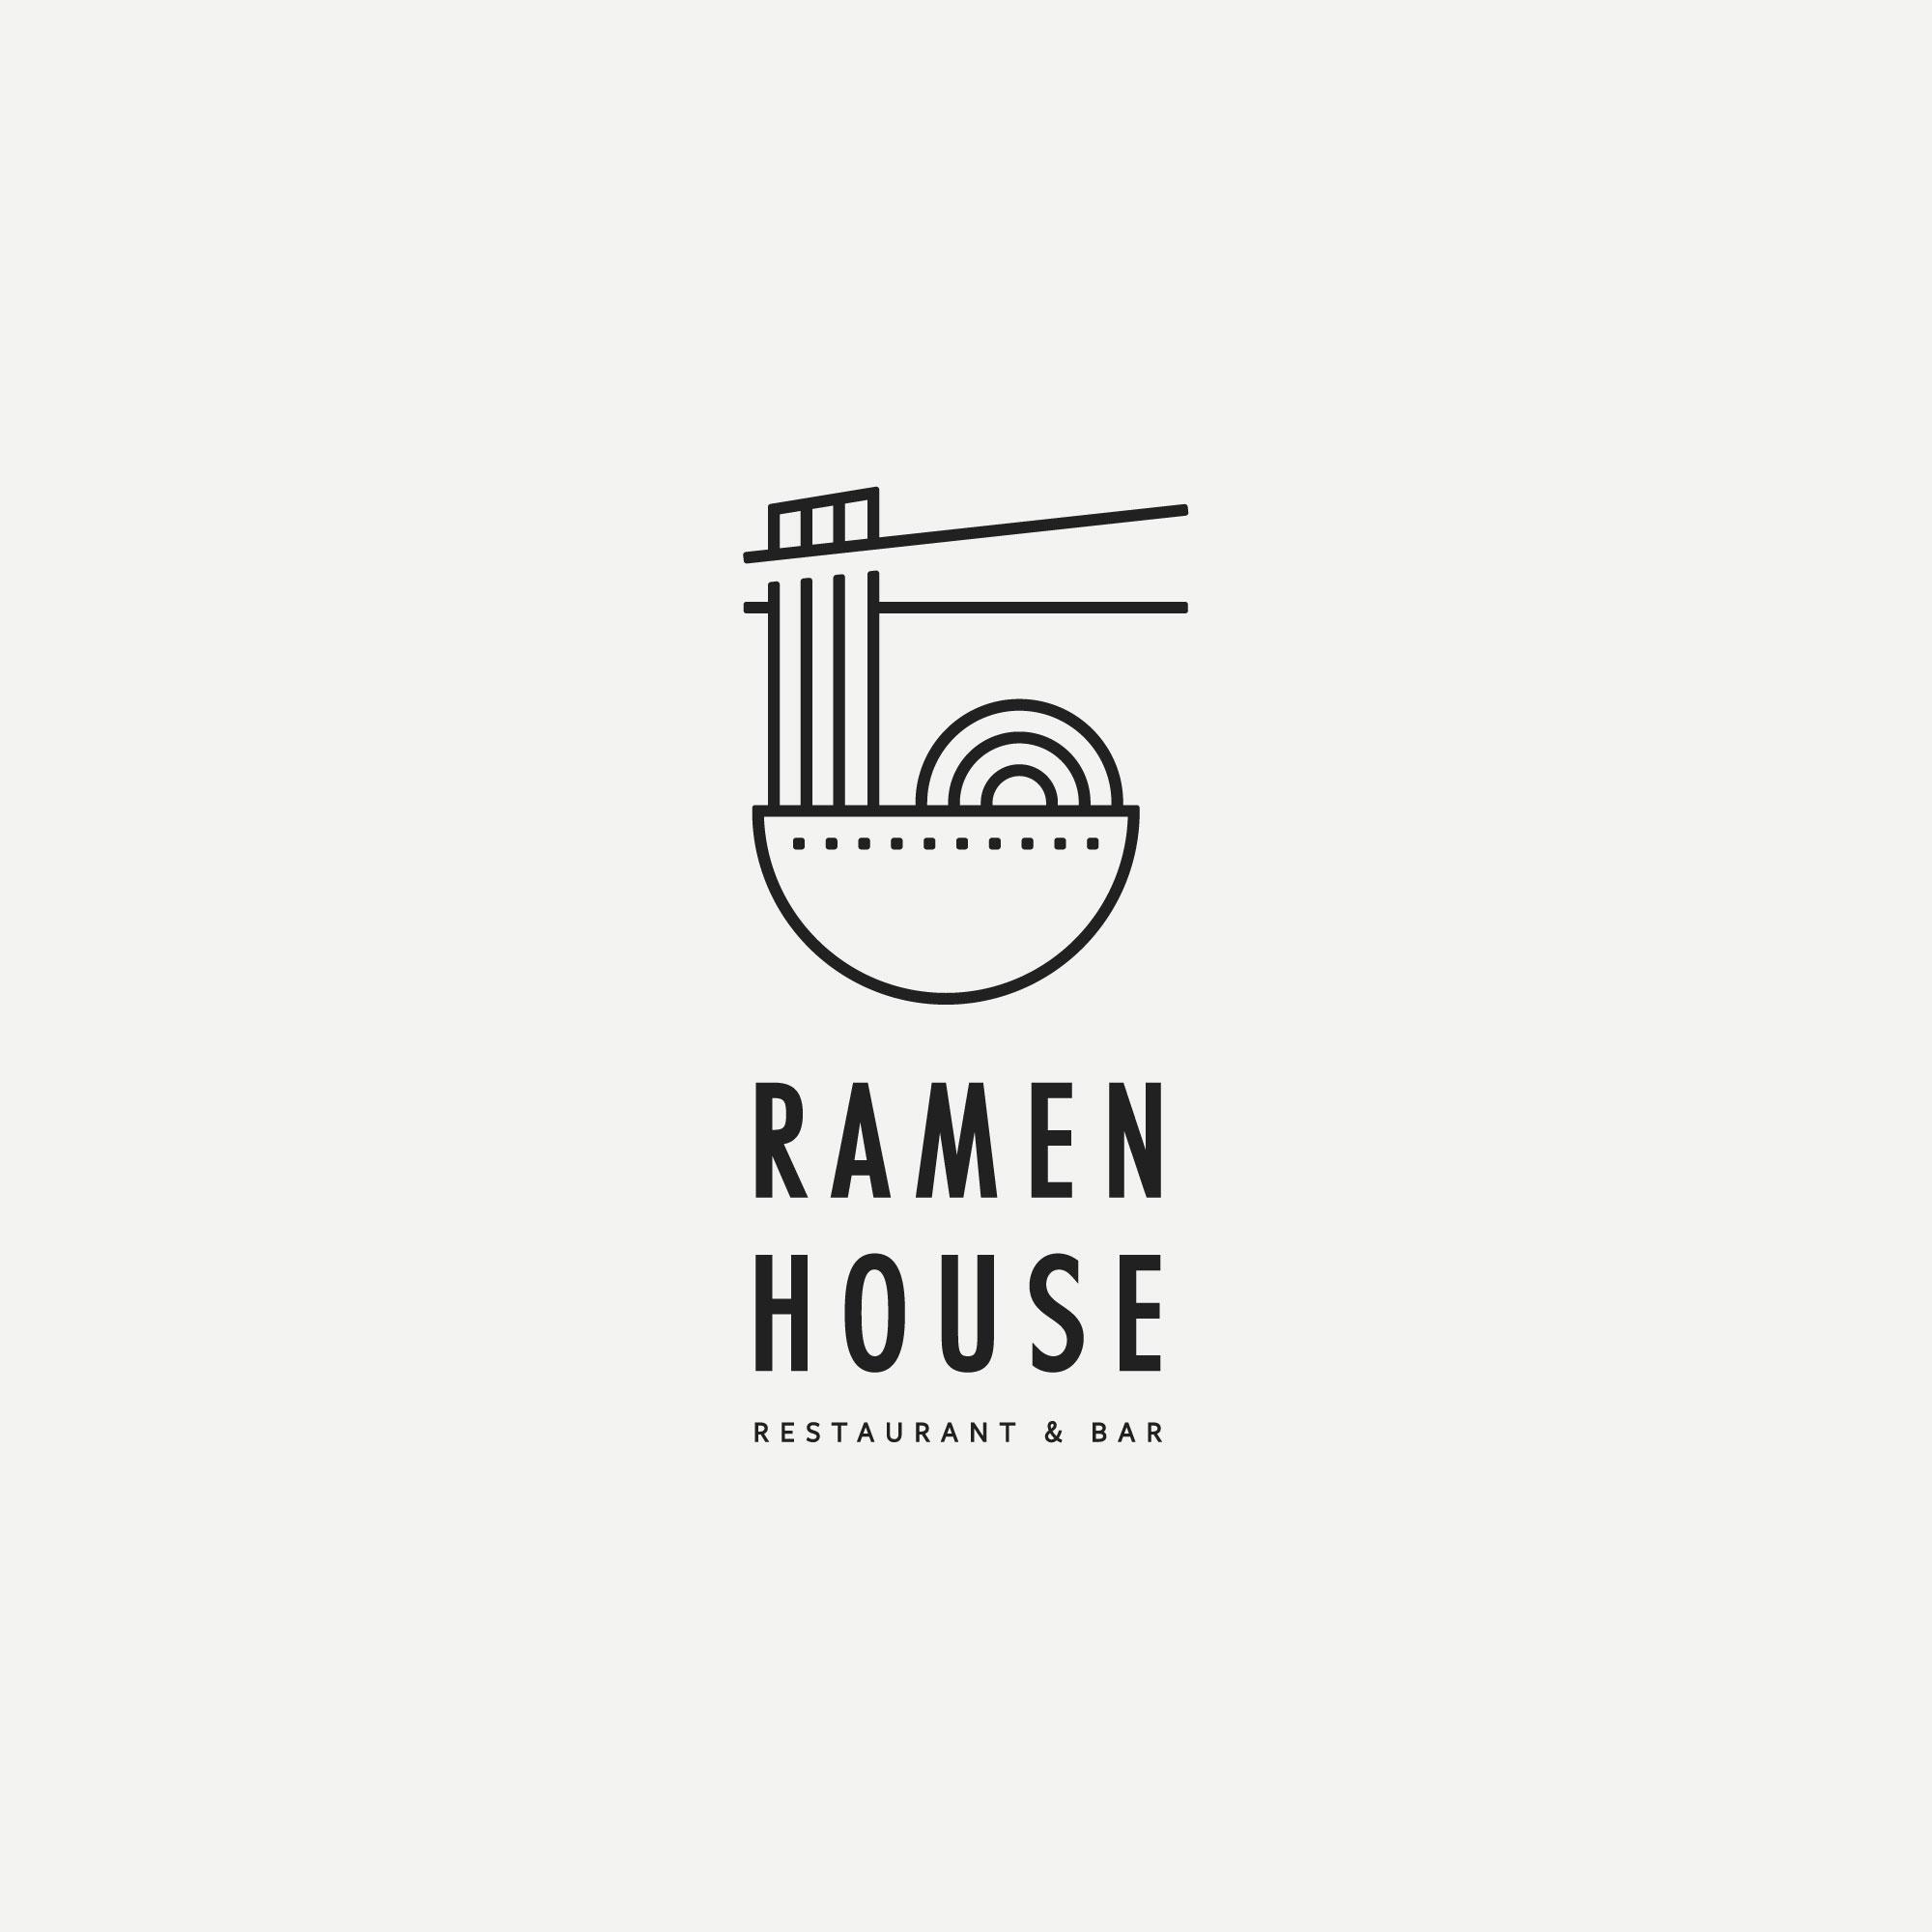 winnipeg-branding-design-logo-restaurant-sushi-ramen-food-clover-and-crow